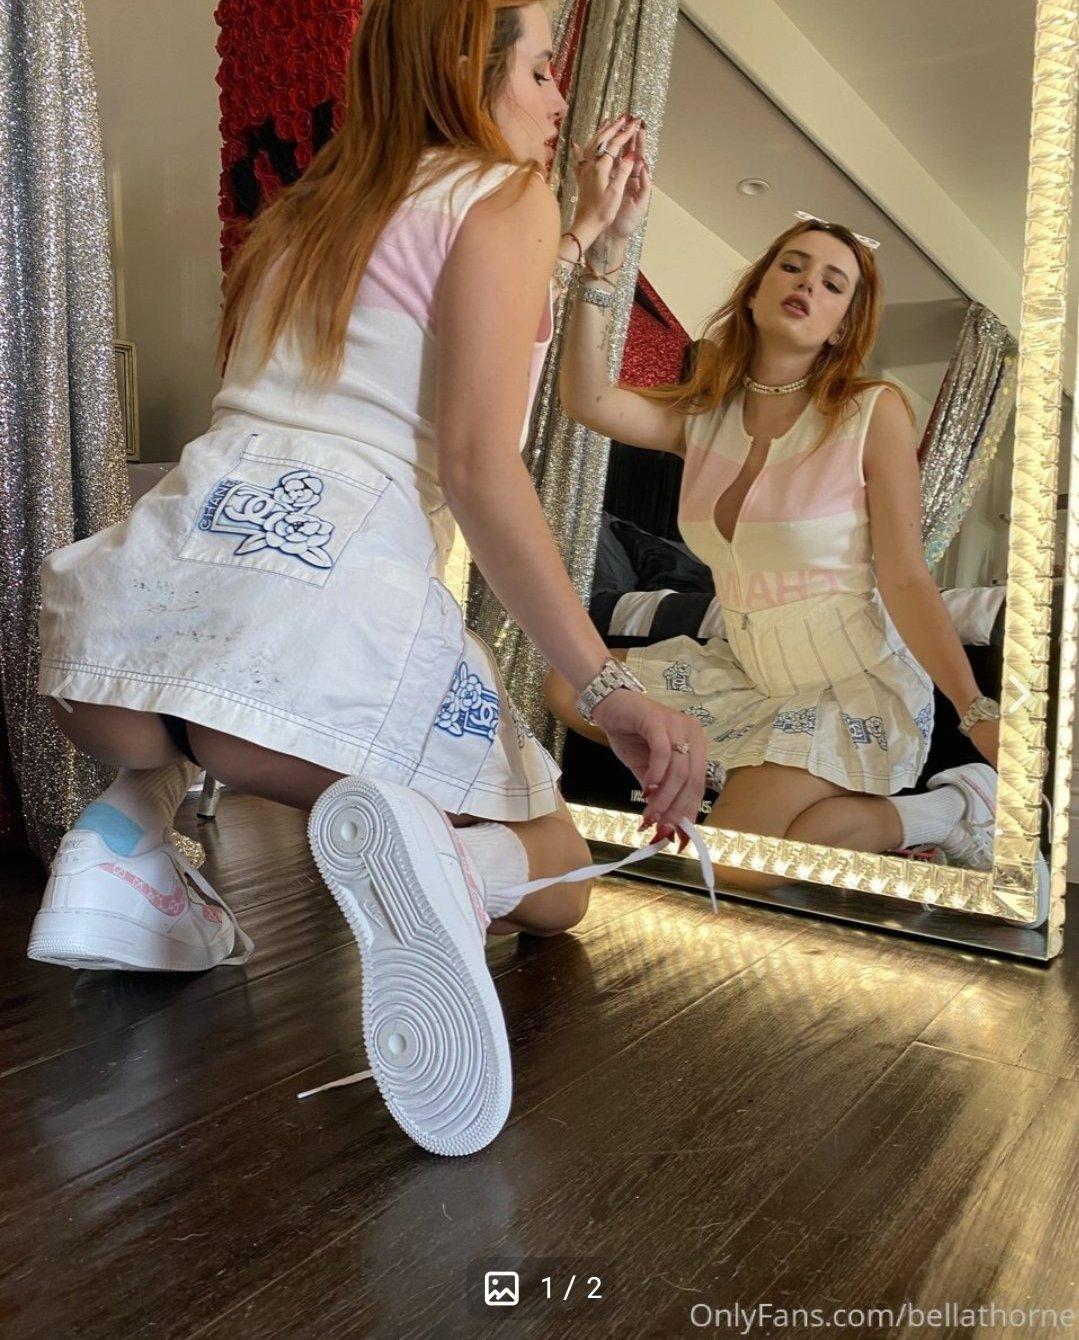 Bella Thorne Bellathorne Onlyfans Nude Leaks 0010